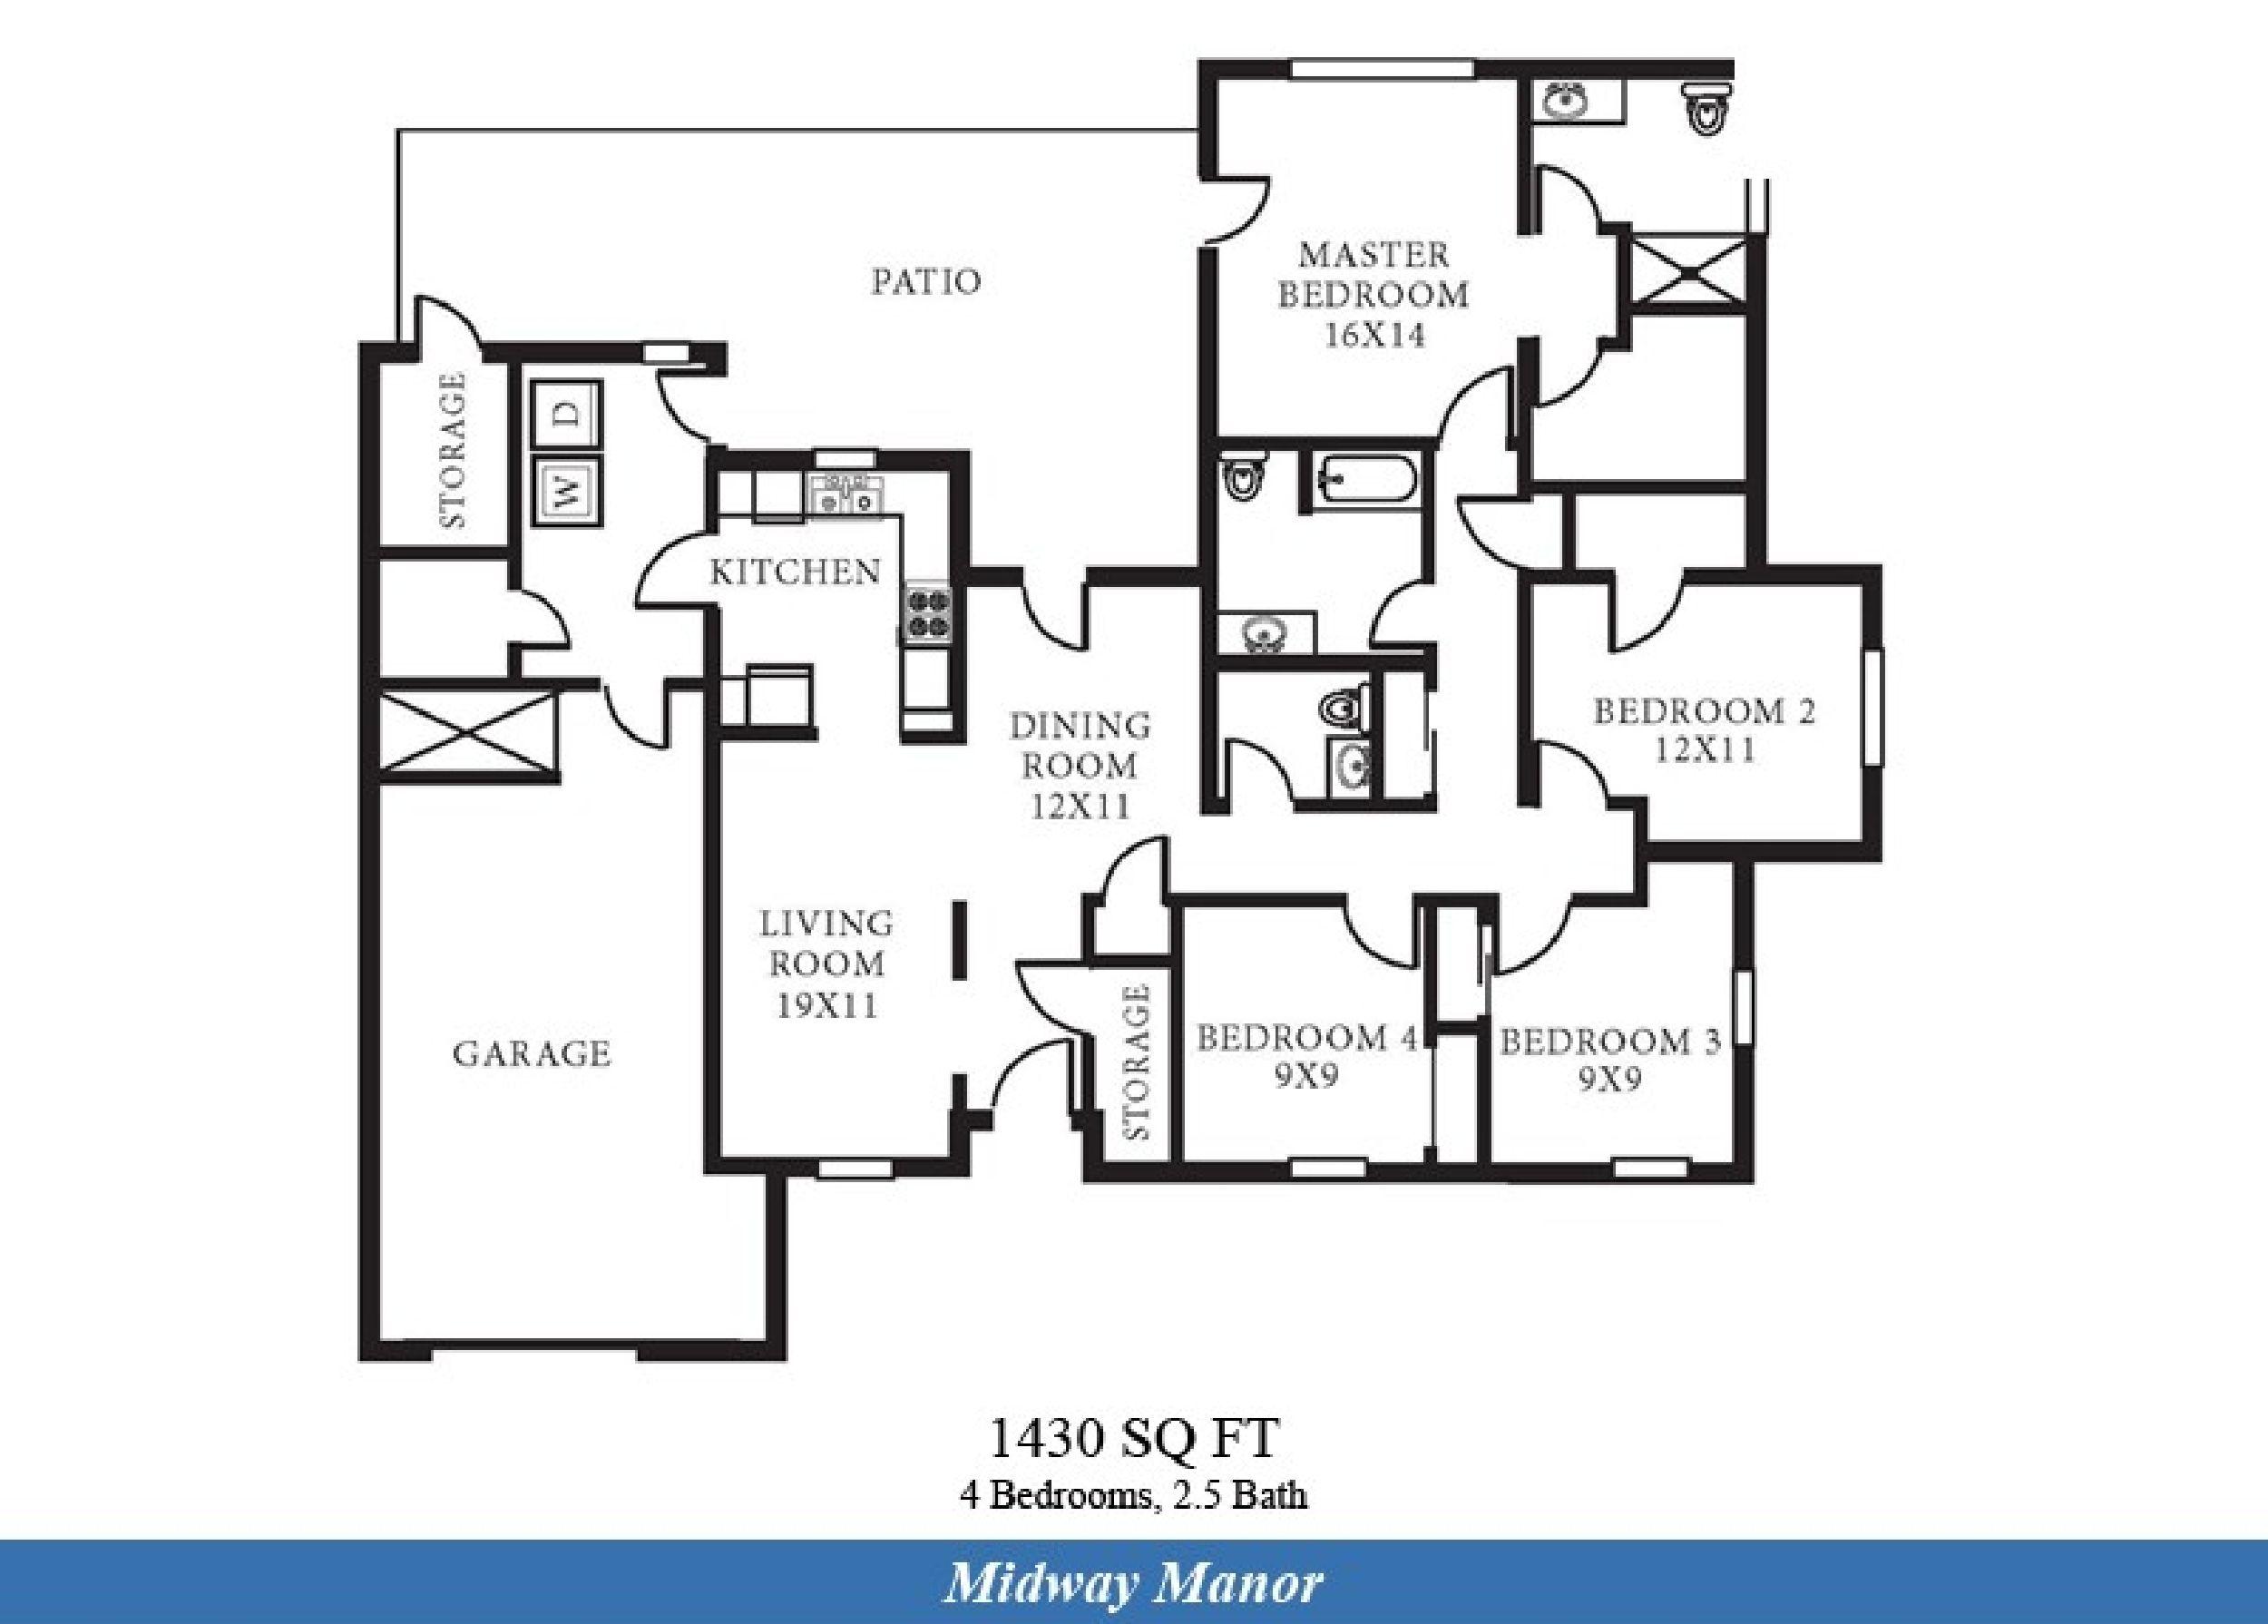 nas oceana u2013 midway manor neighborhood 4 bedroom 2 5 bathroom